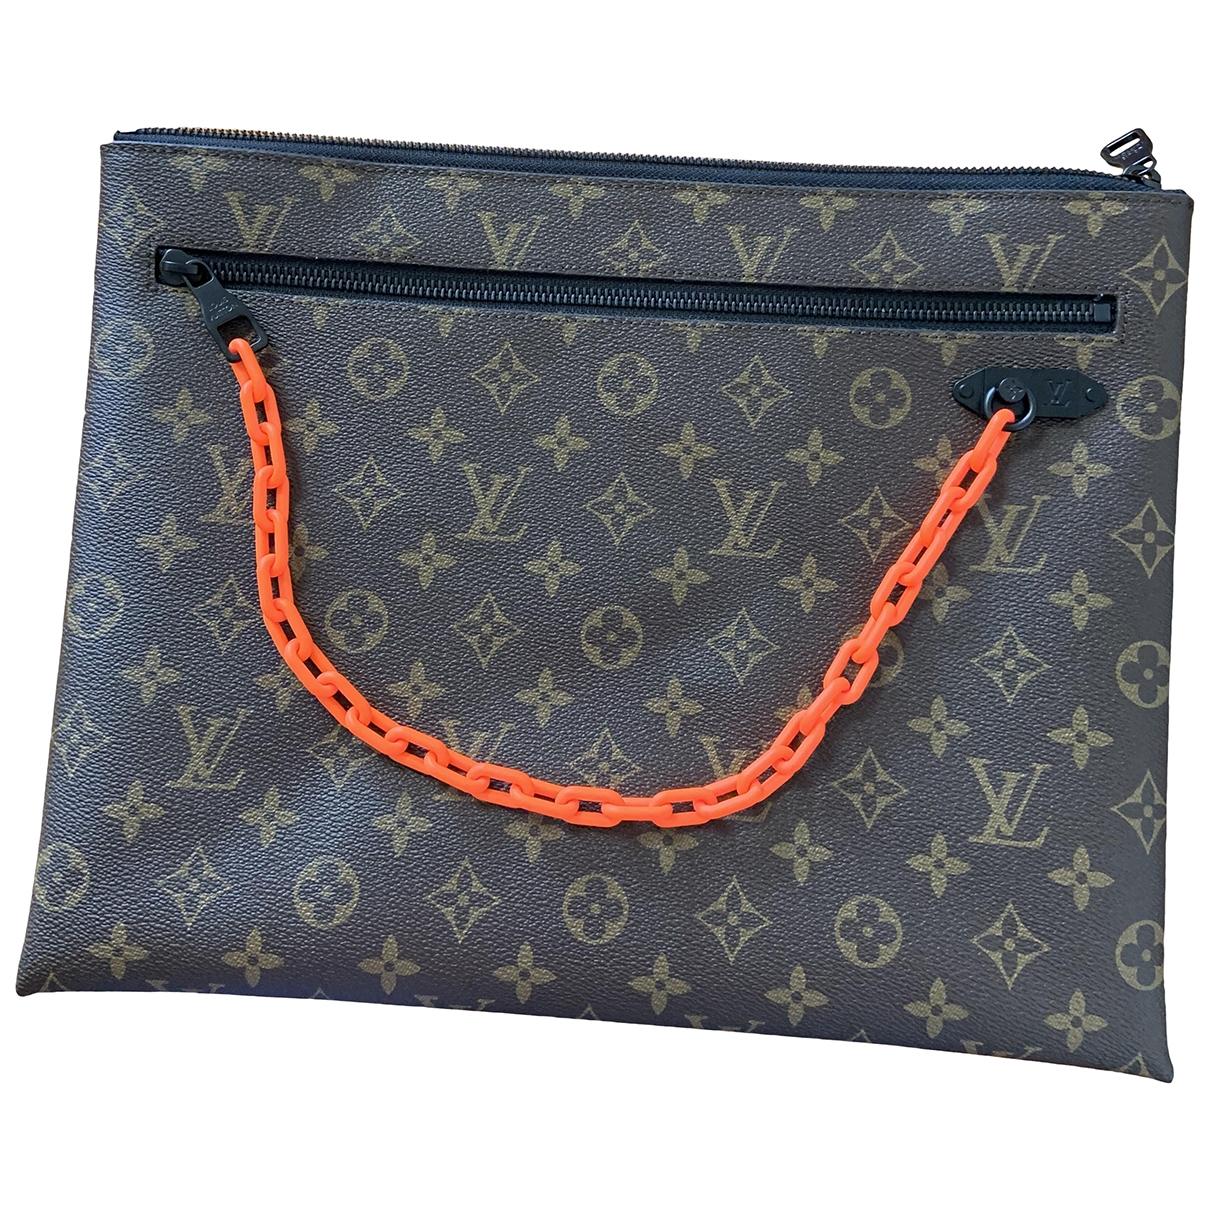 Bolso Pochette A4 de Lona Louis Vuitton